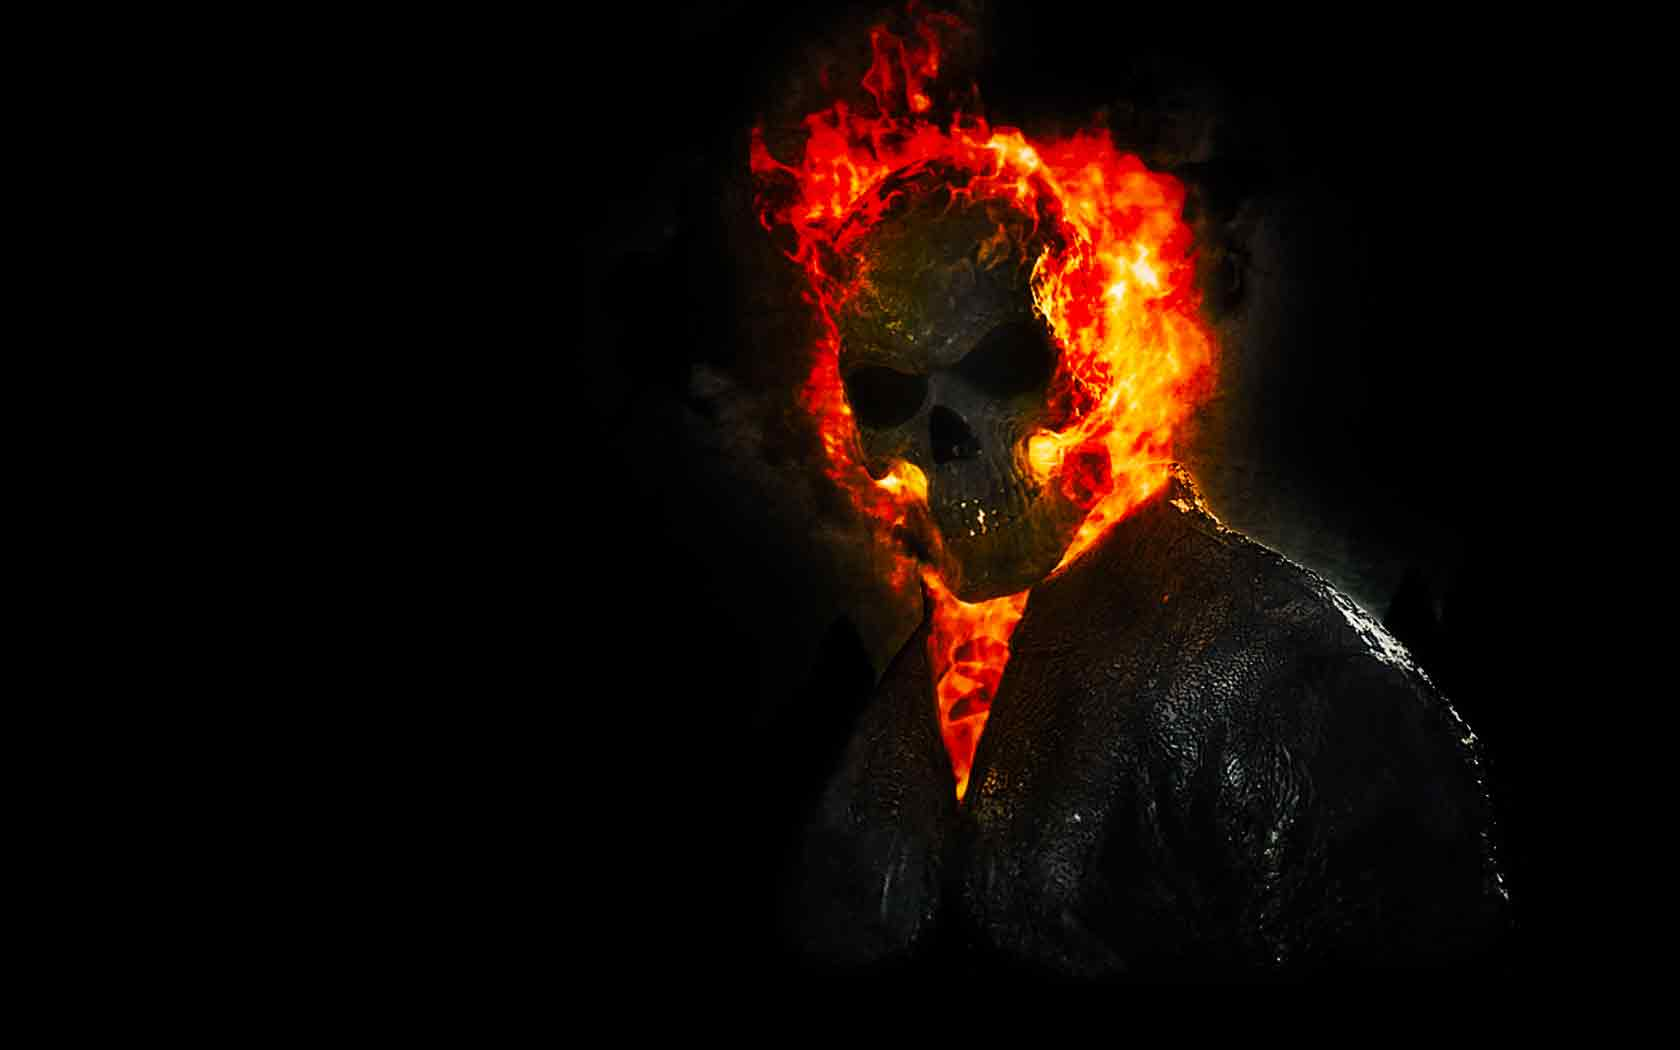 Ghost Rider Spirit of Vengeance wallpaper walls hdwalls4com 1680x1050